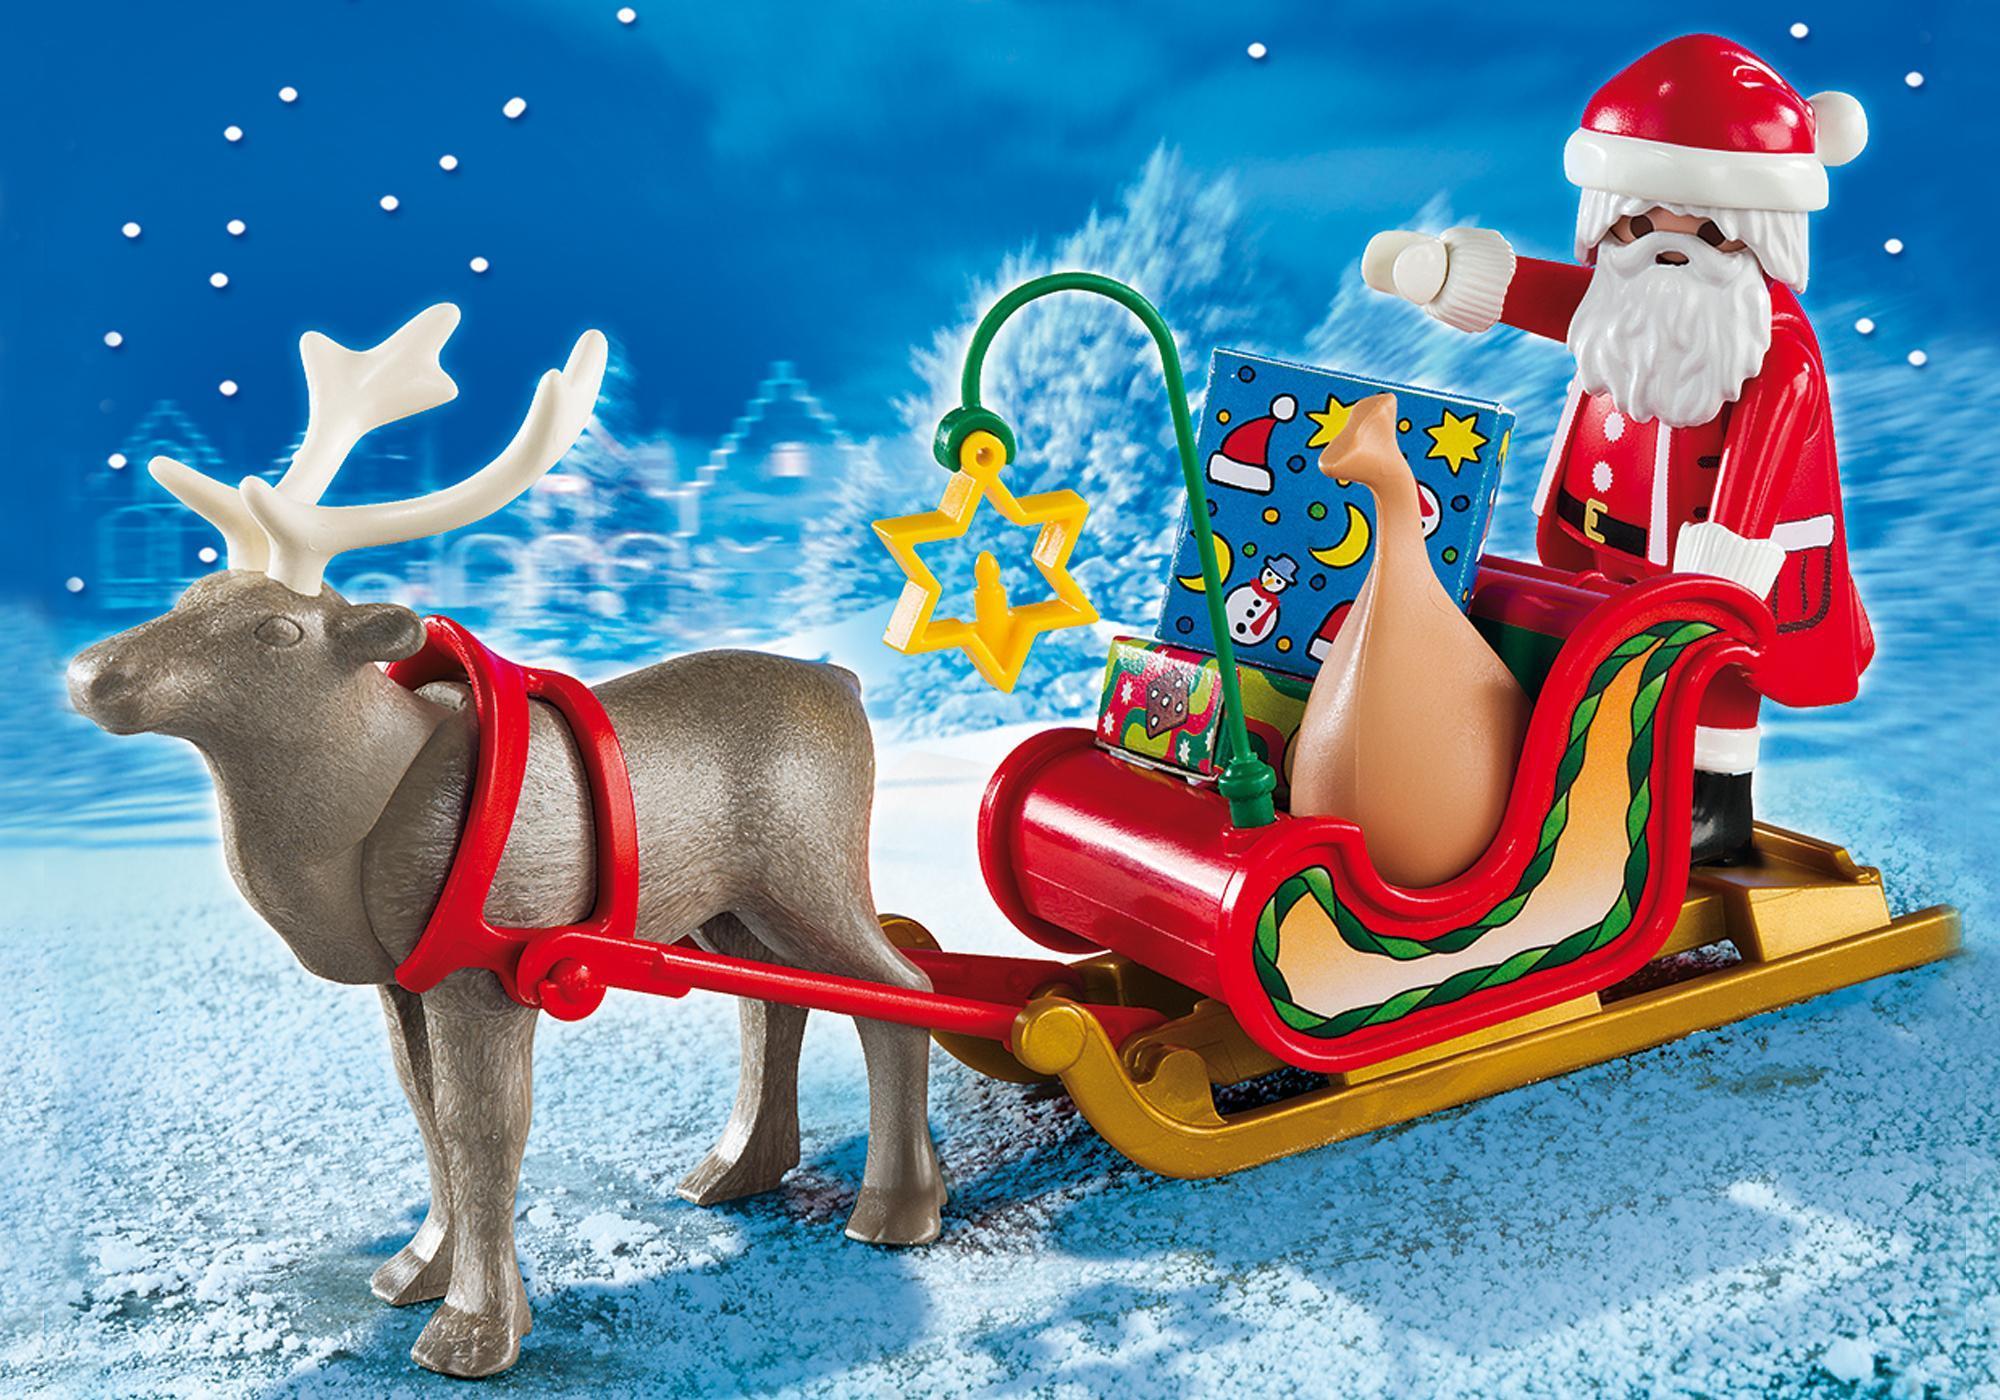 santa s sleigh with reindeer 5590 playmobil united kingdom